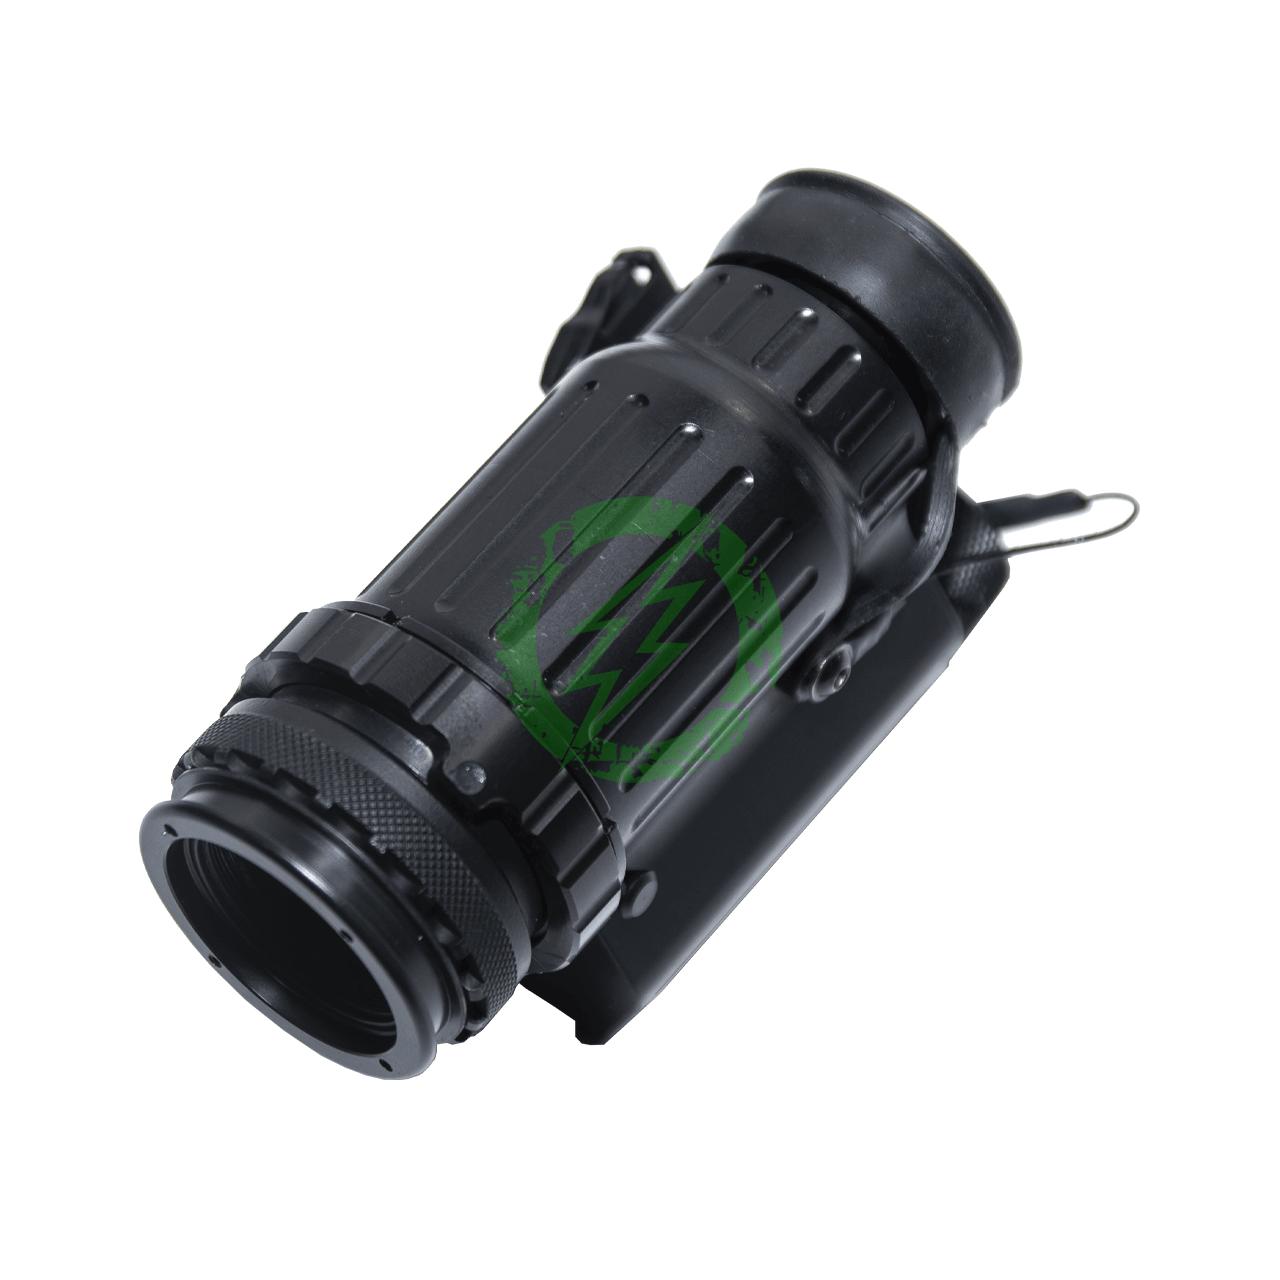 Photonis 16 Mono PD Pro-M with 4G Tube